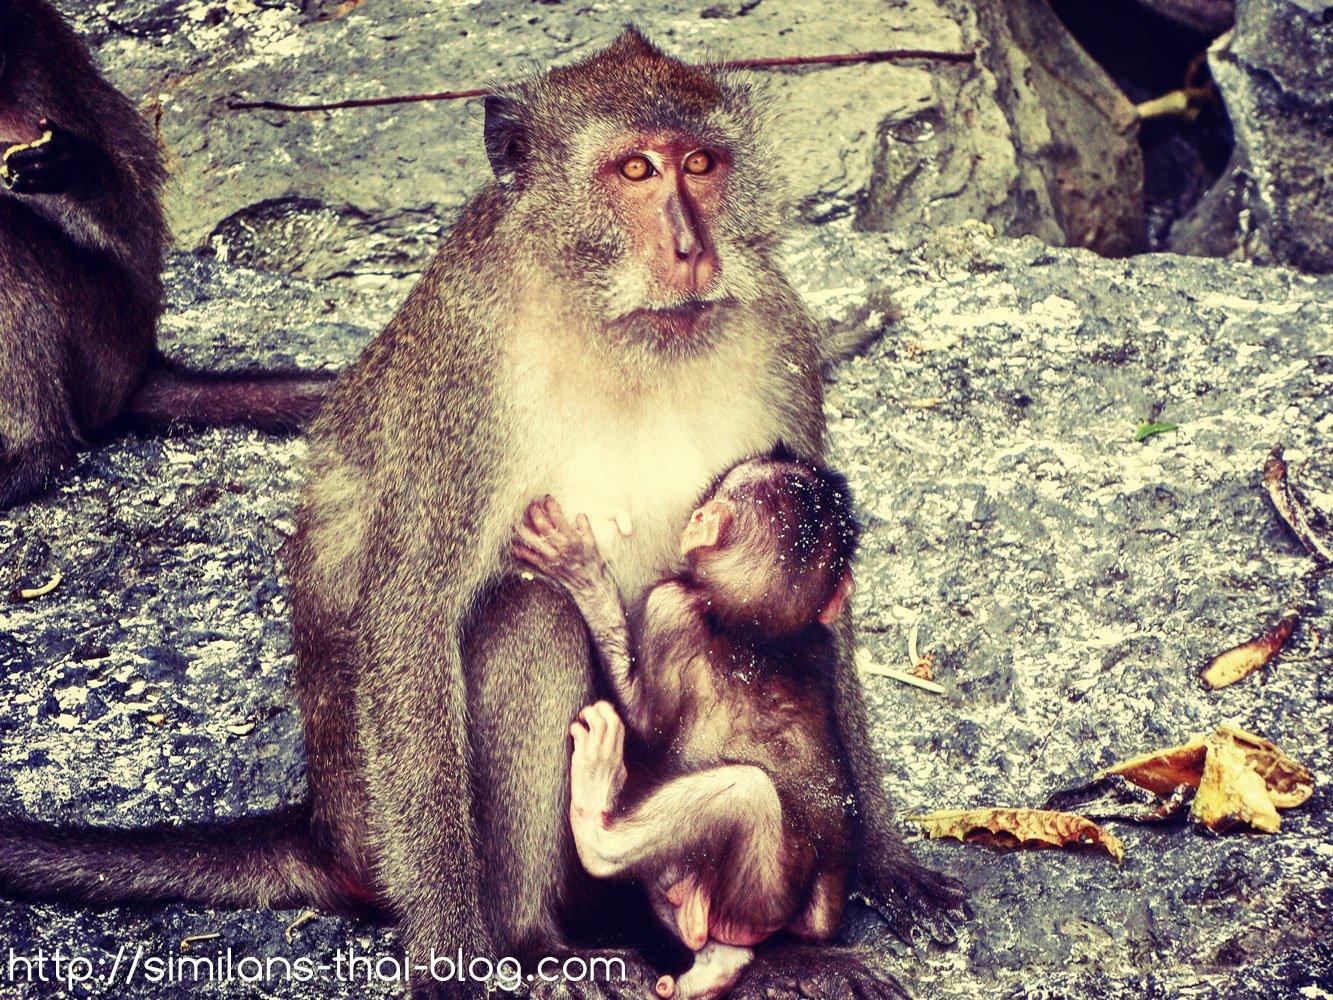 monkeymom-with-child